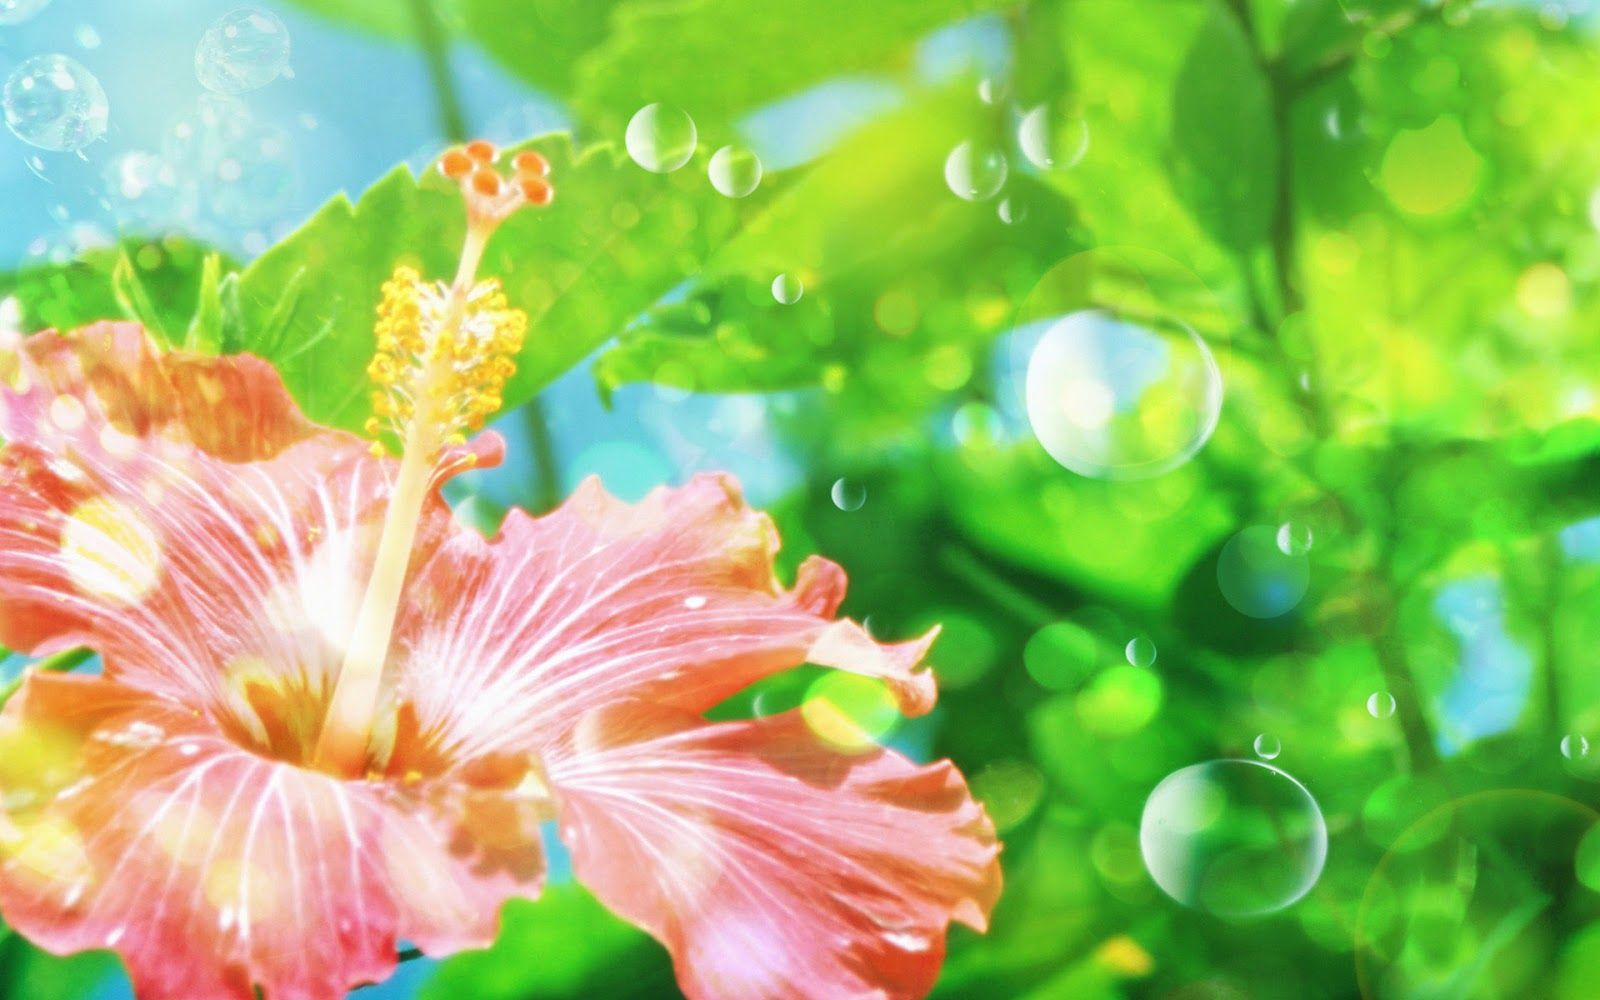 Hd wallpaper to download - Download Hd Flower Wallpaper